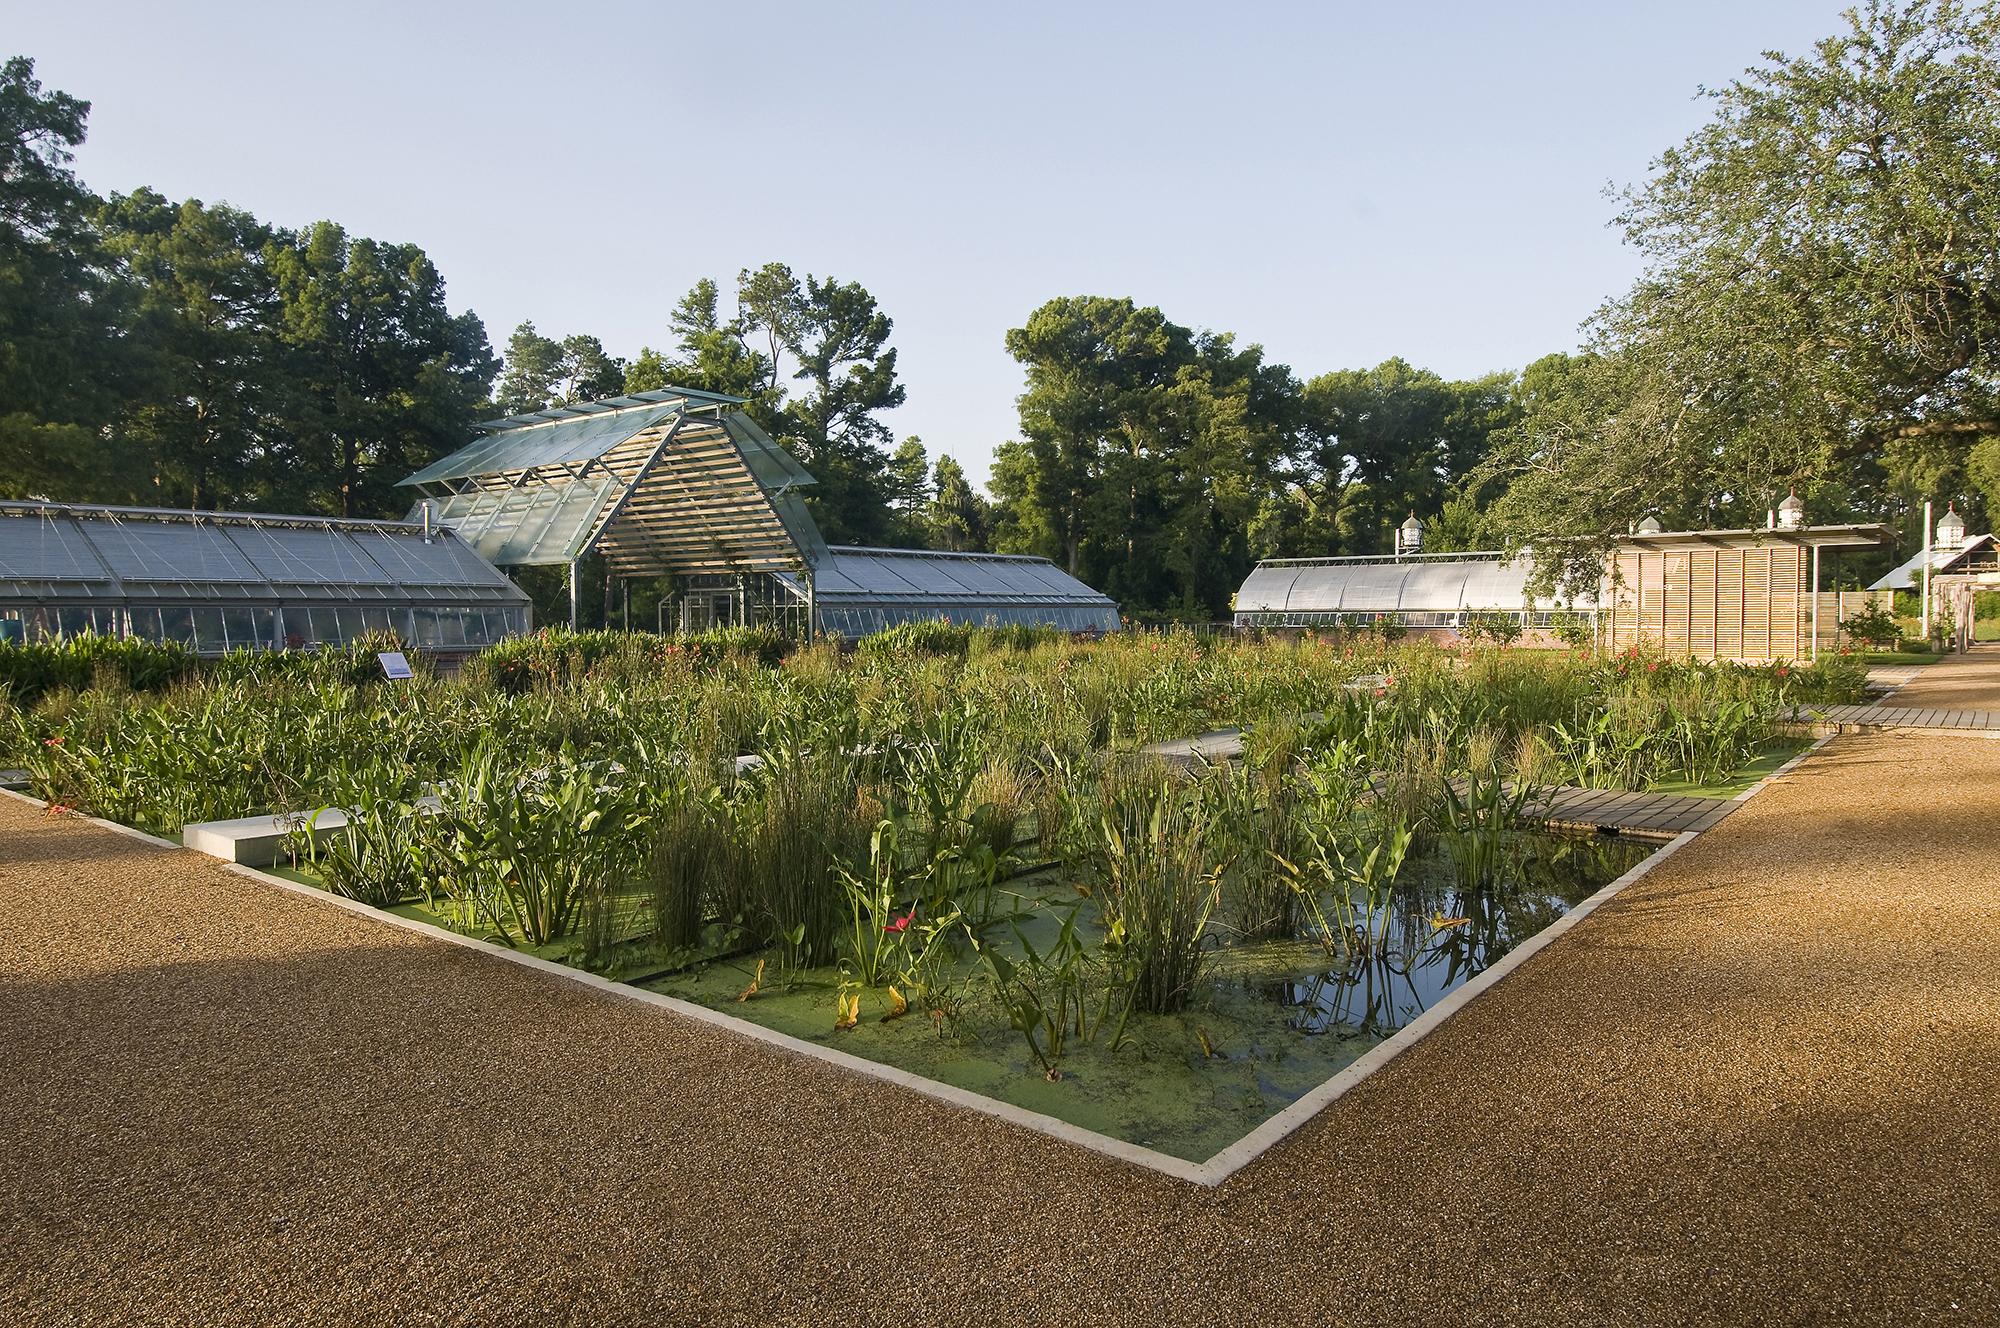 Shangri La Botanical Gardens And Nature Center The Beck Group